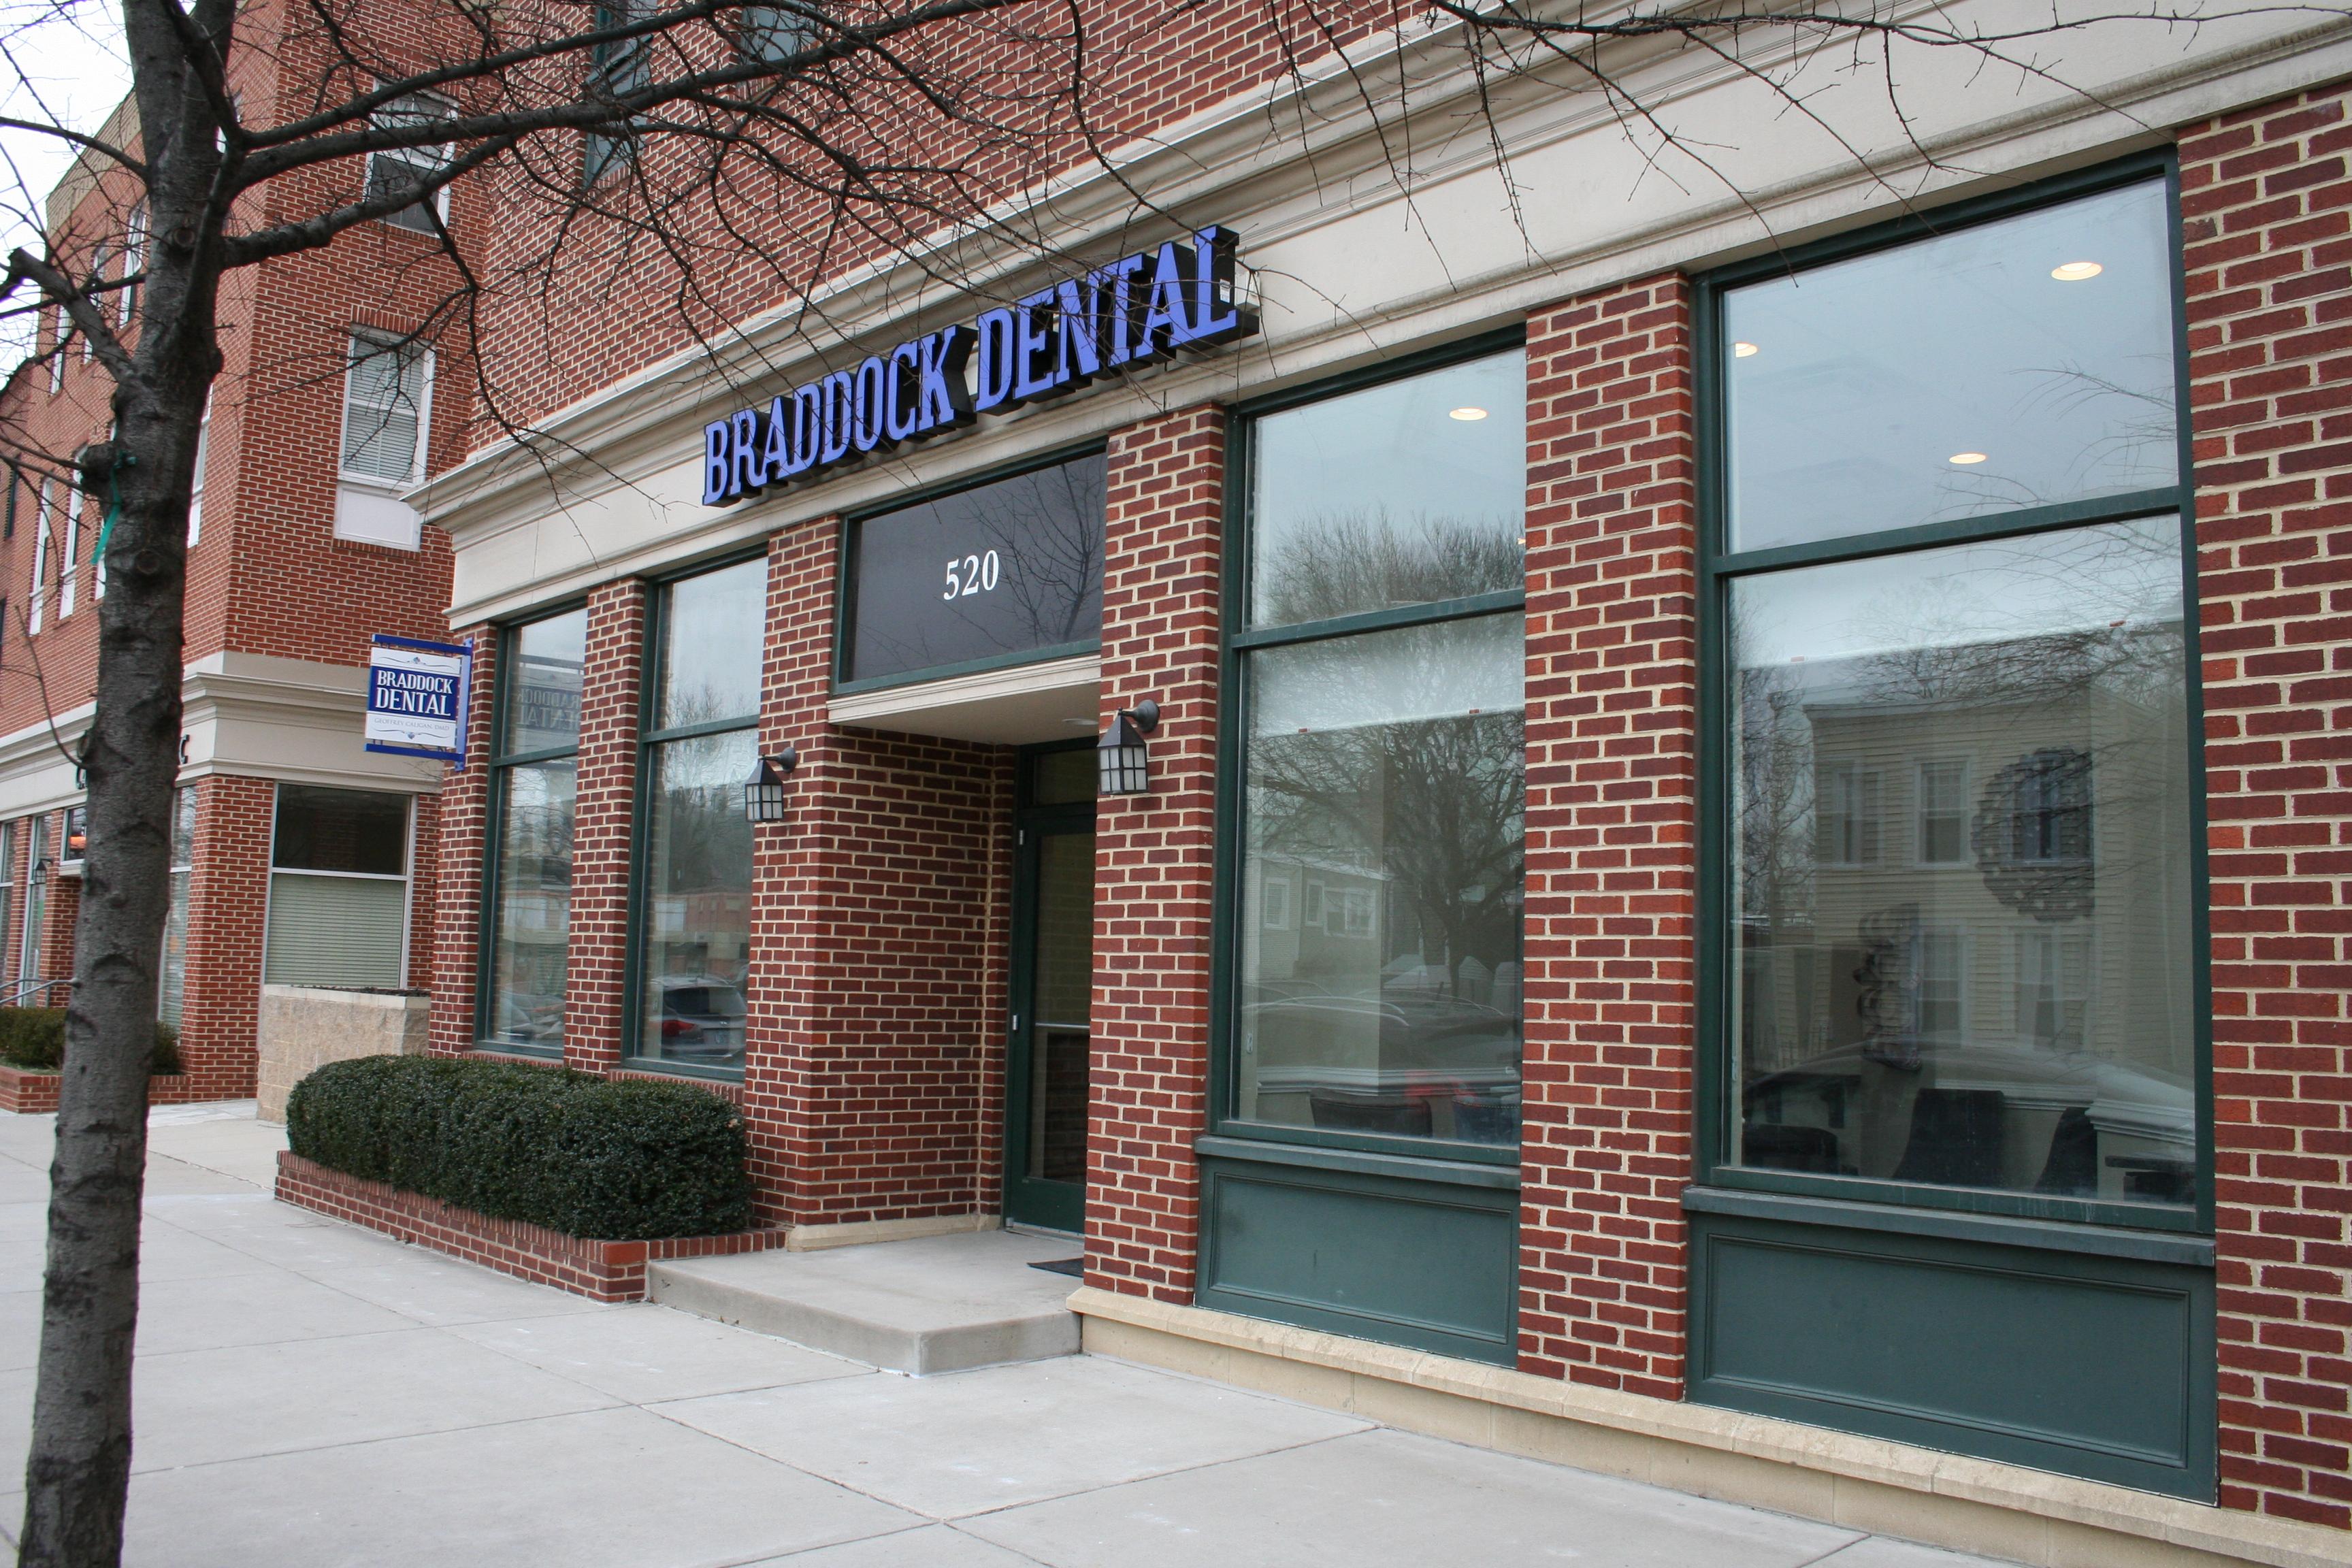 Braddock Dental - Office Building